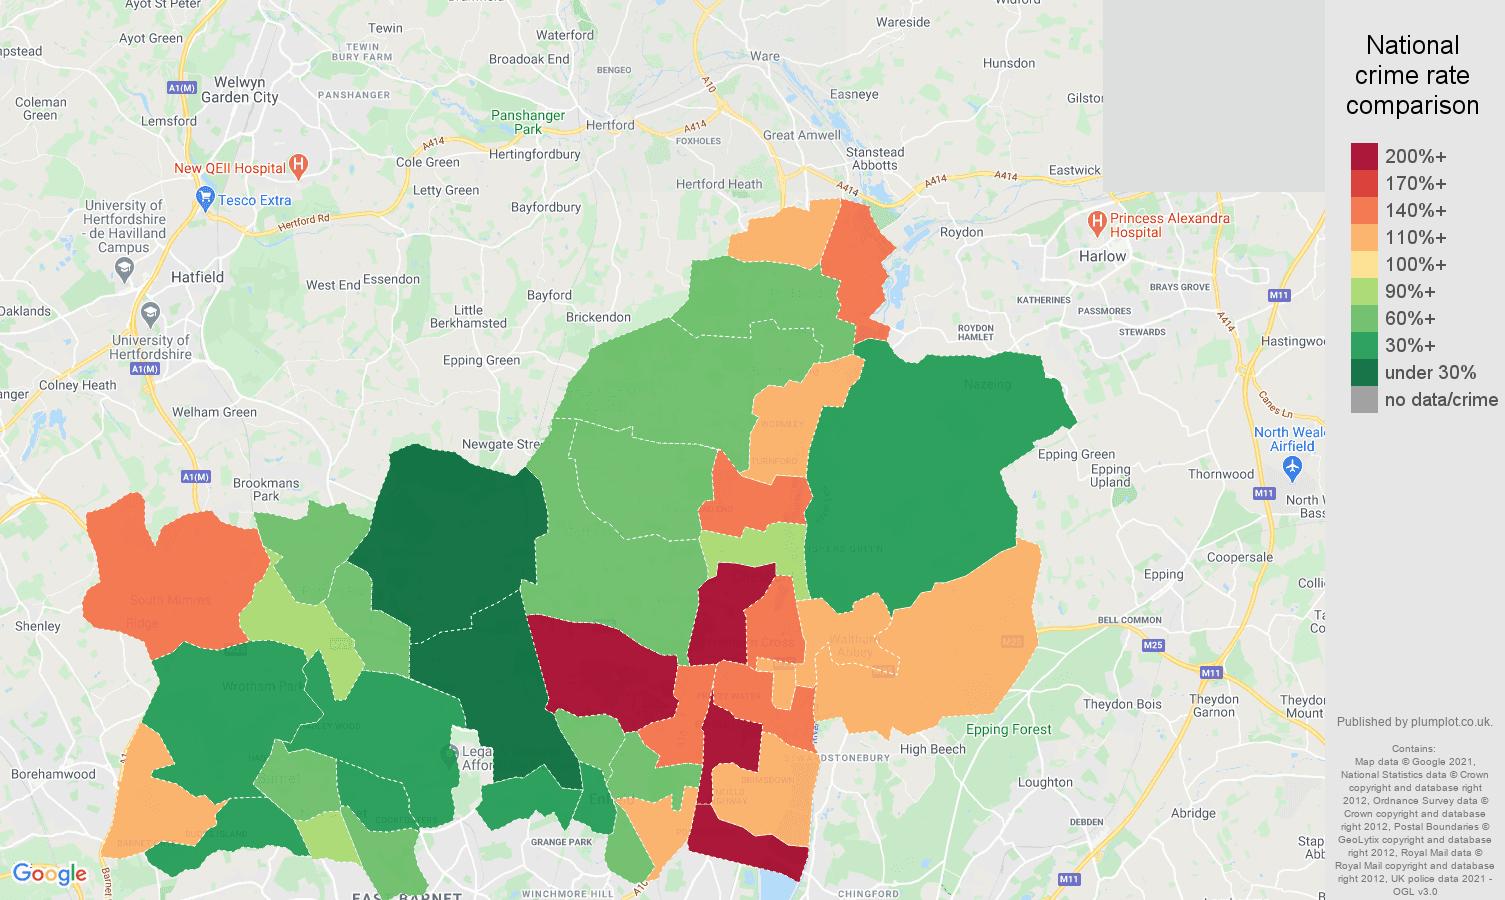 Enfield drugs crime rate comparison map